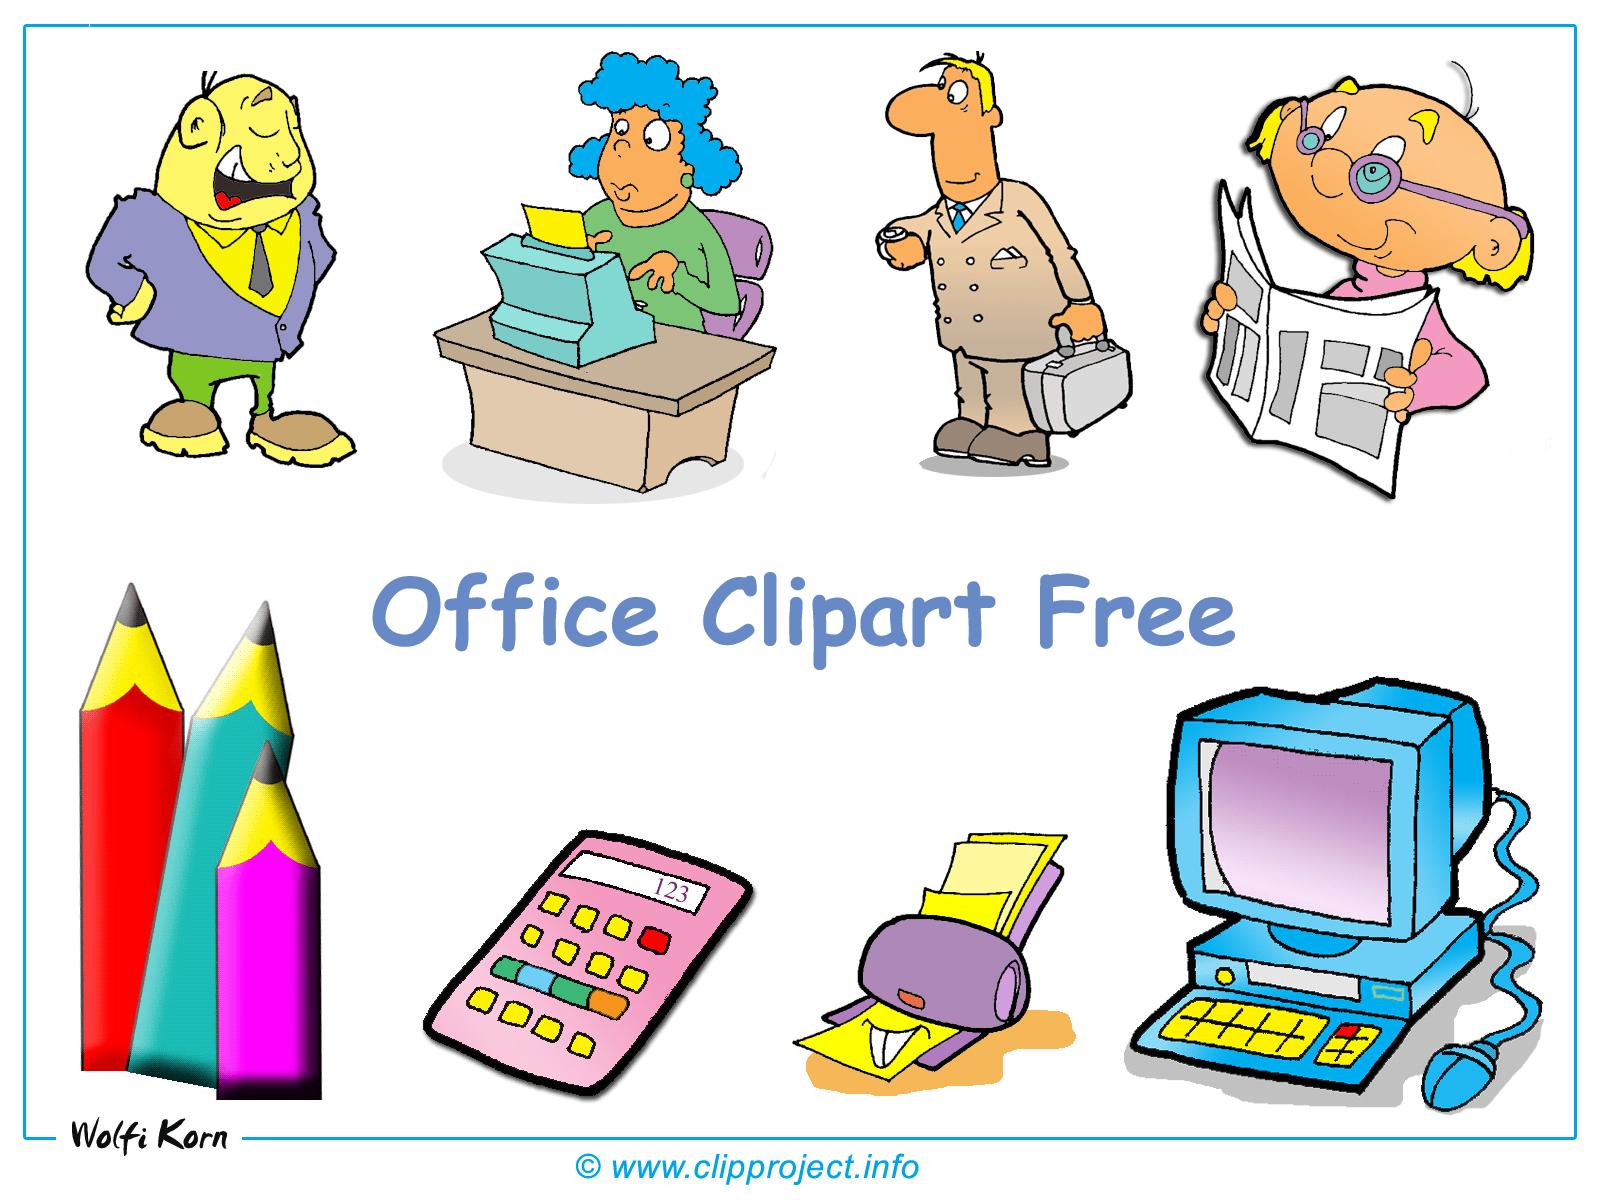 Office Clip Art Office Clip Art Office C-Office Clip Art Office Clip Art Office Clip Art Office-3